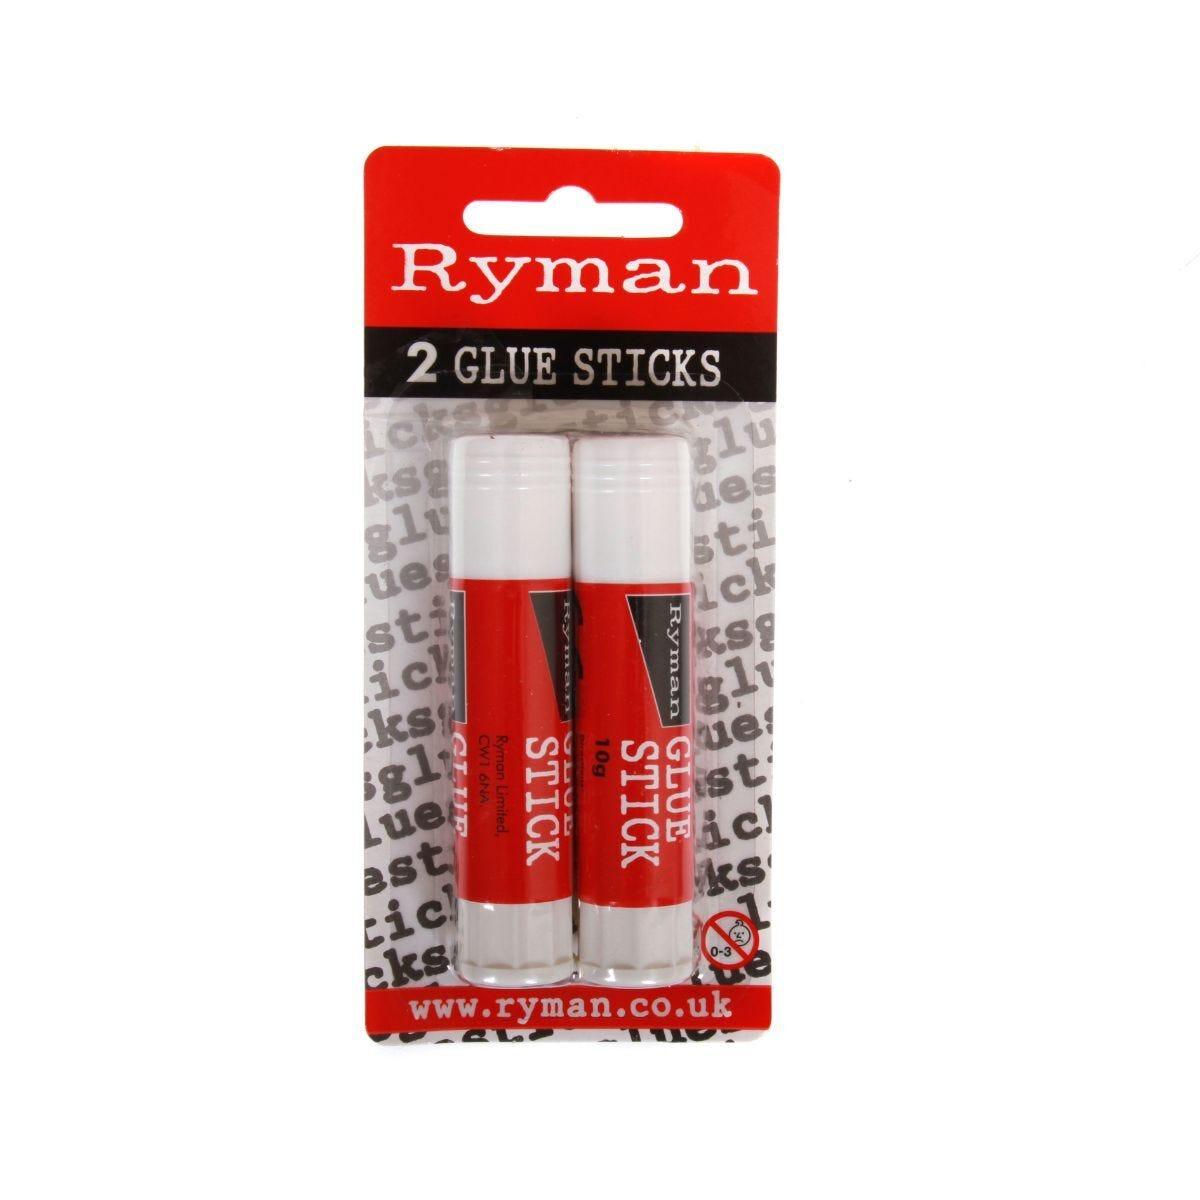 Ryman Coloured Glue Stick 10g Pack of 2